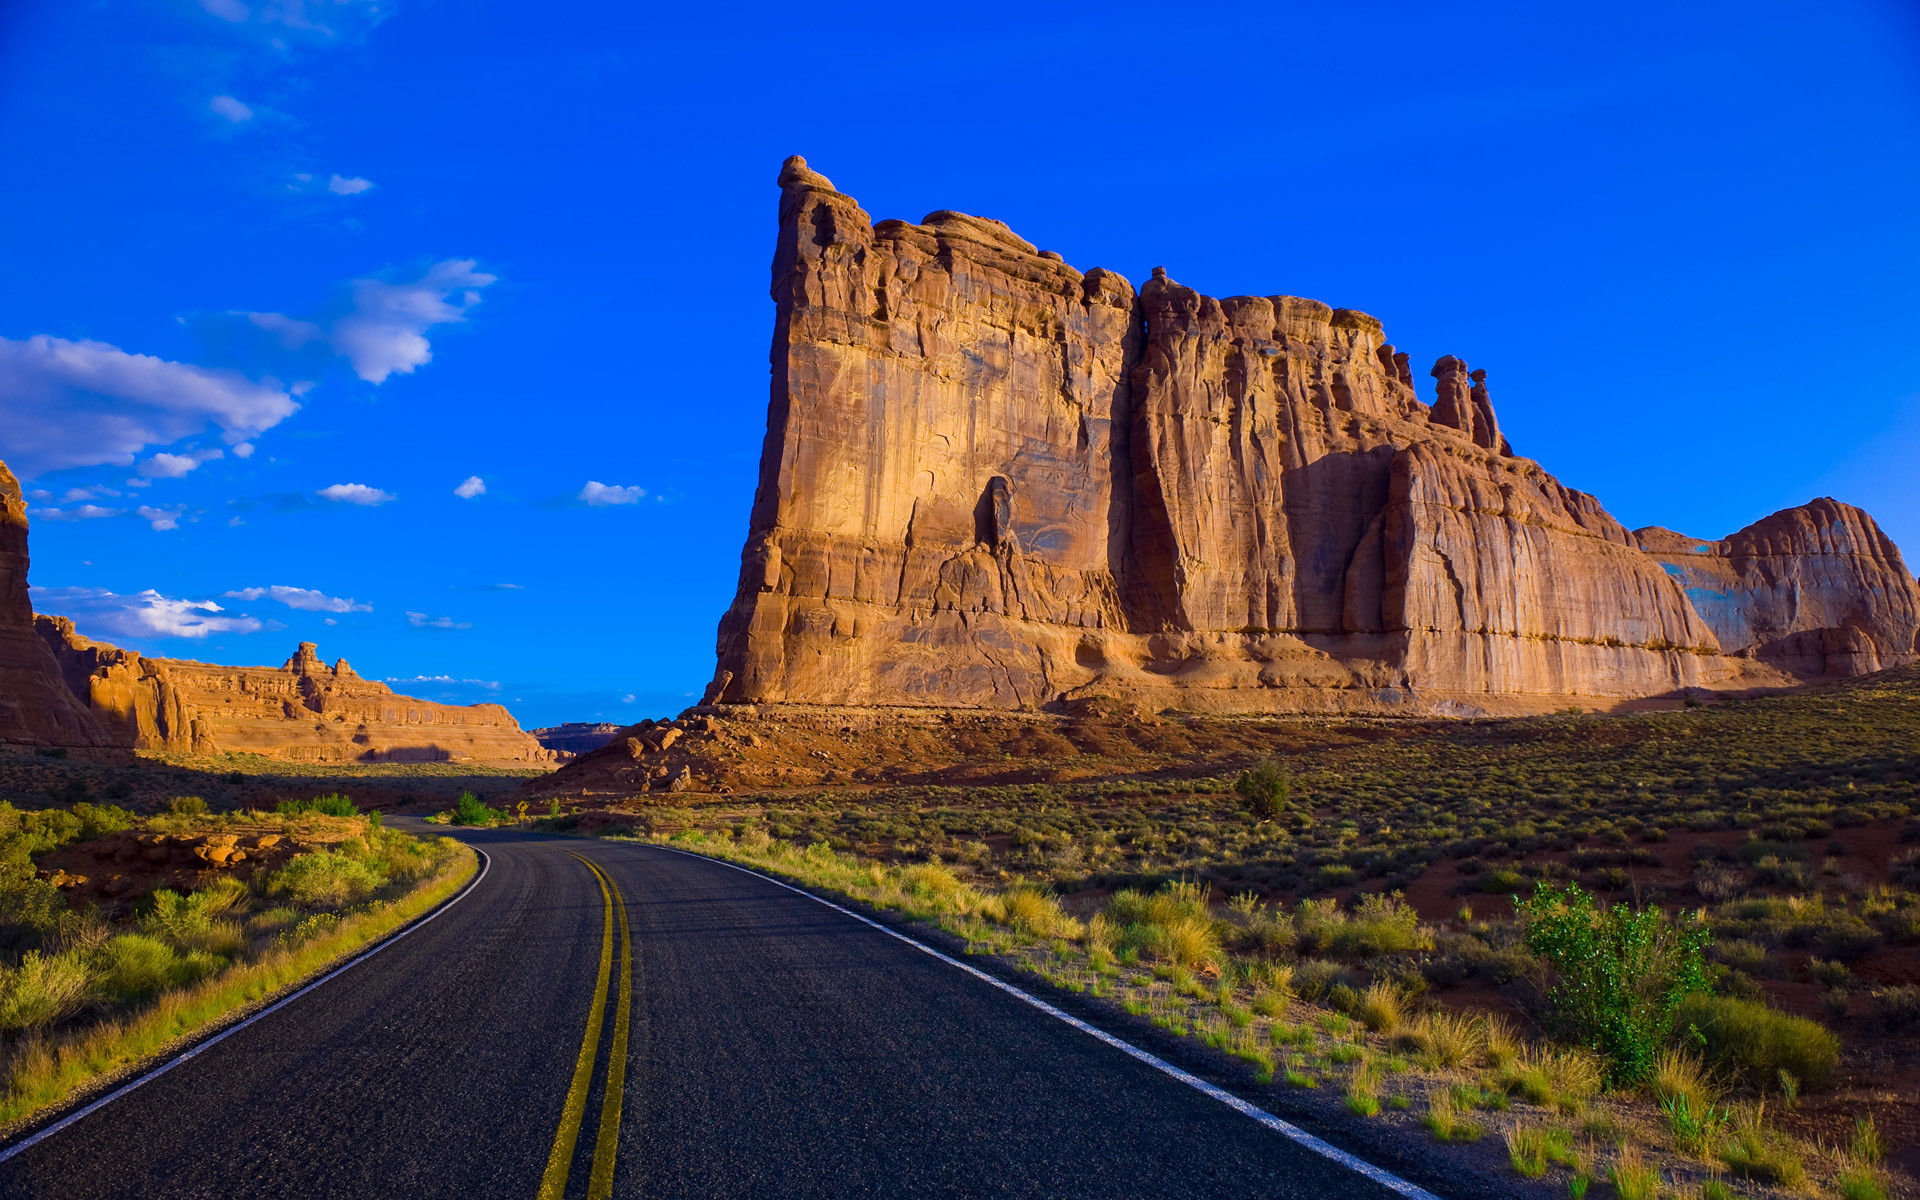 Windows 7 Desktop Backgrounds, Theme: American Road Trip